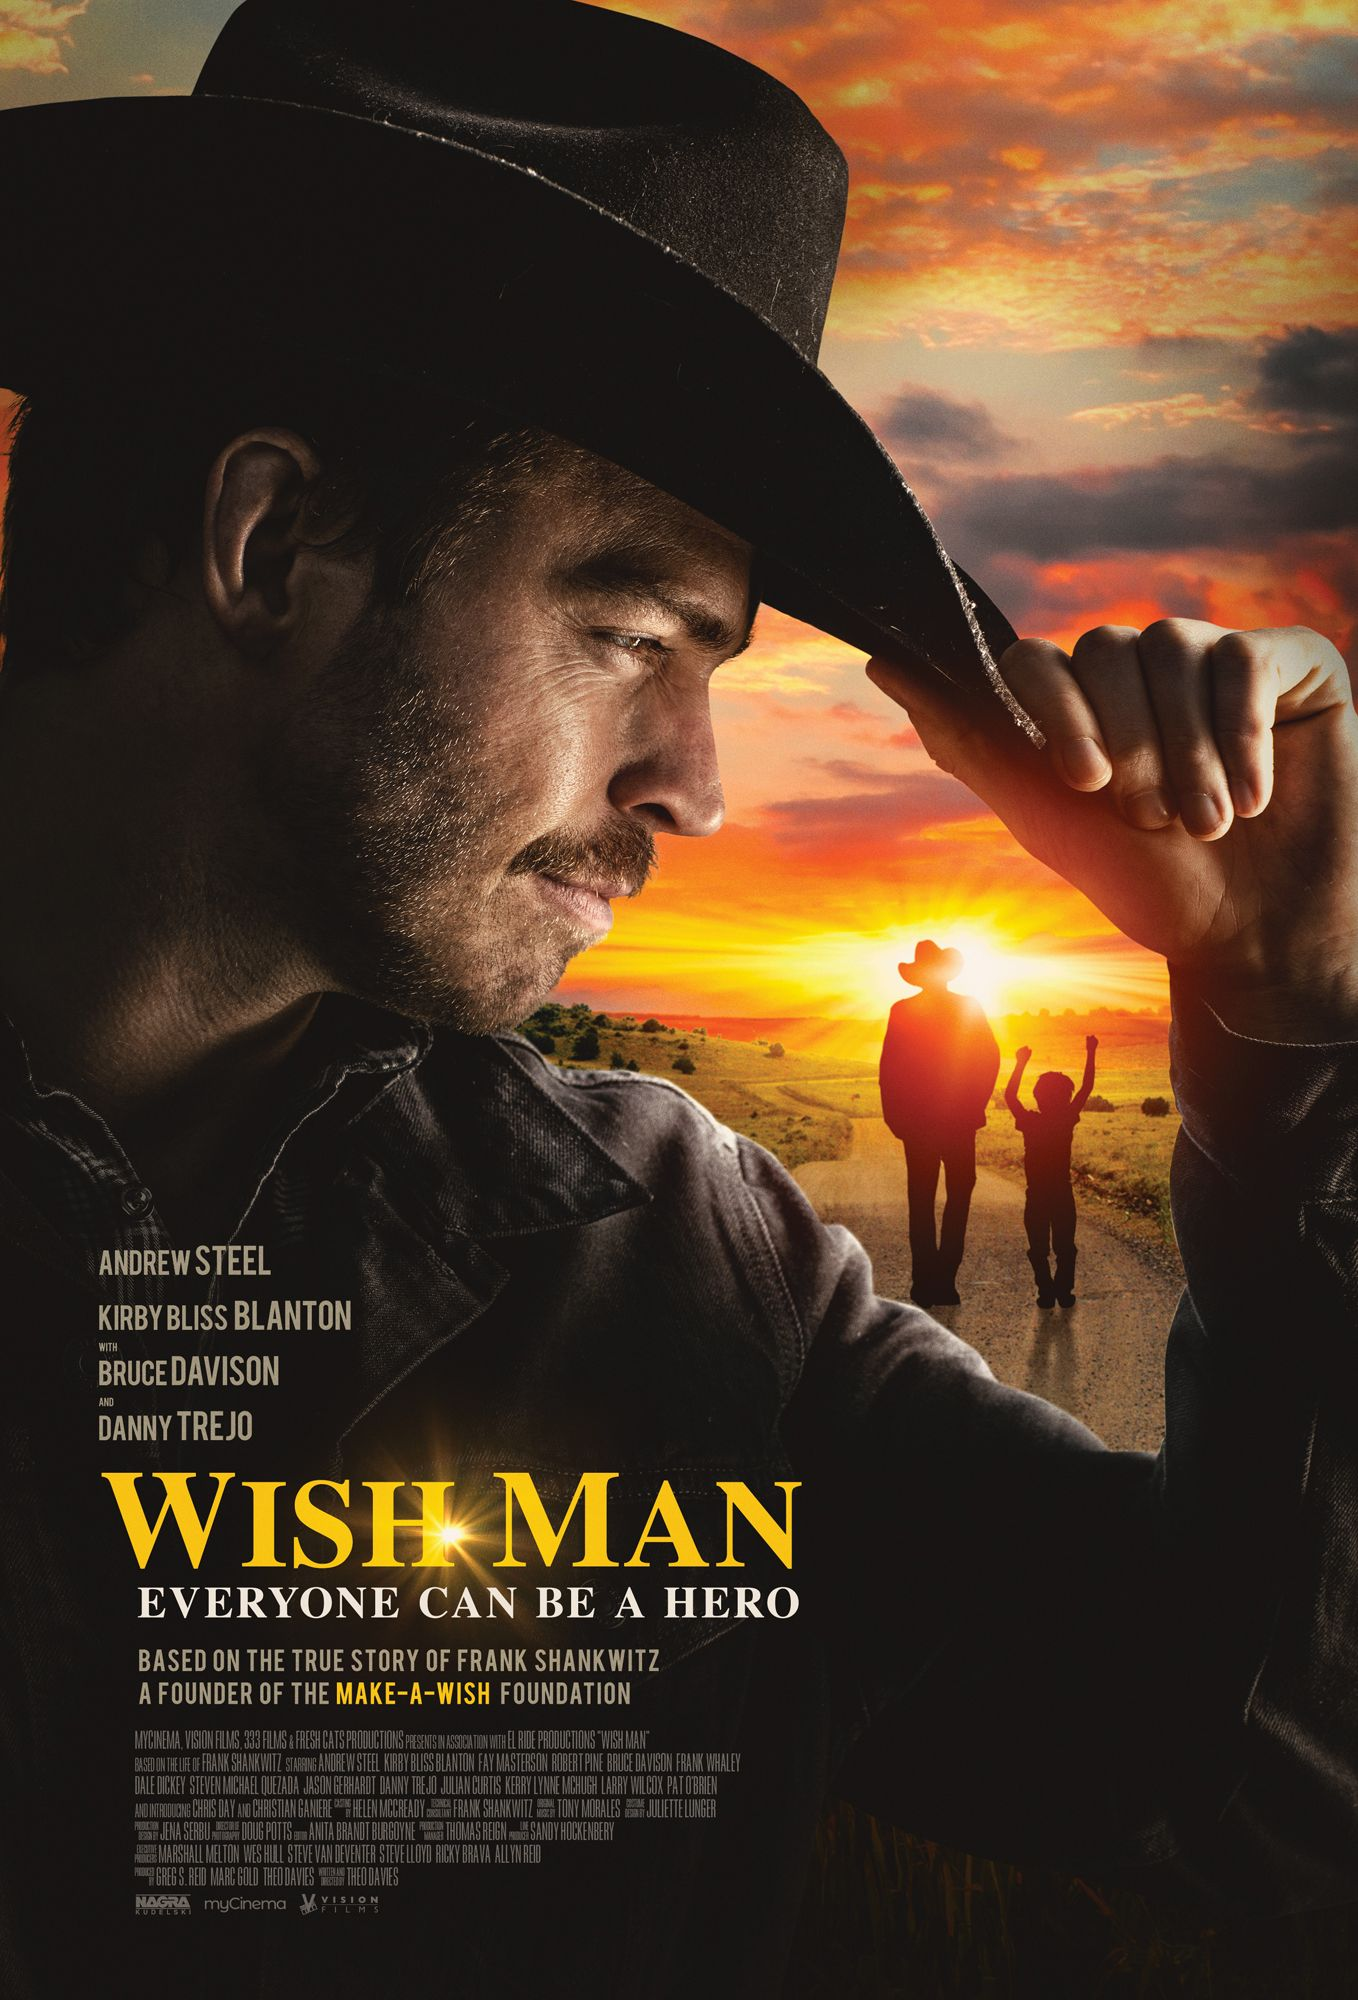 Nonton Movie Wish Man Subtitle Indonesia nontonmovie